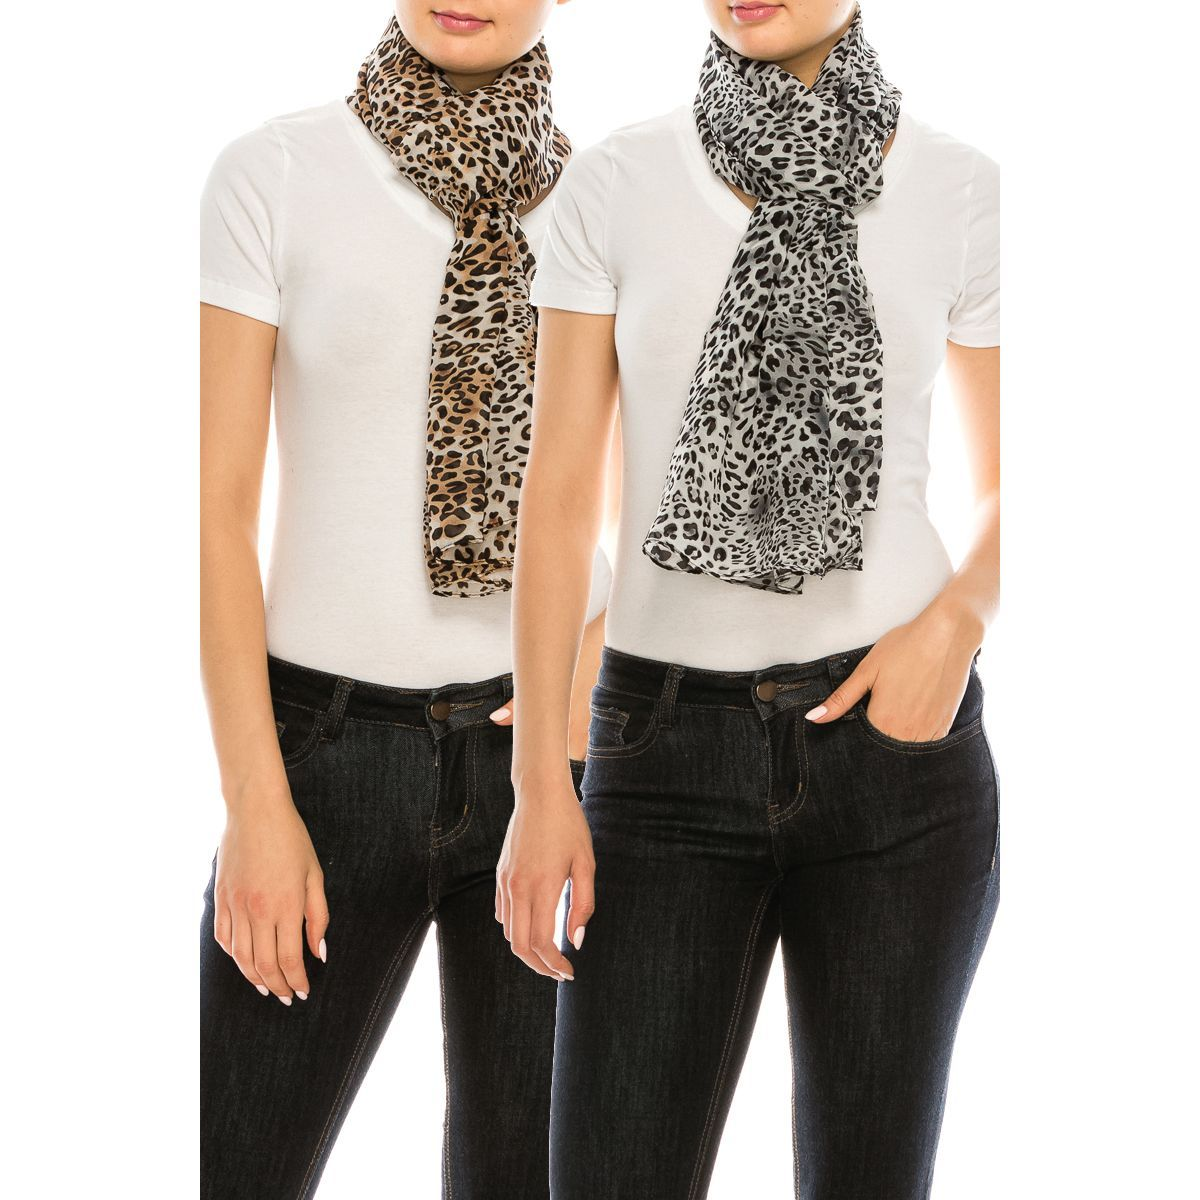 Leopard Pattern Poly Thin Scarf - Fashion Fantasia